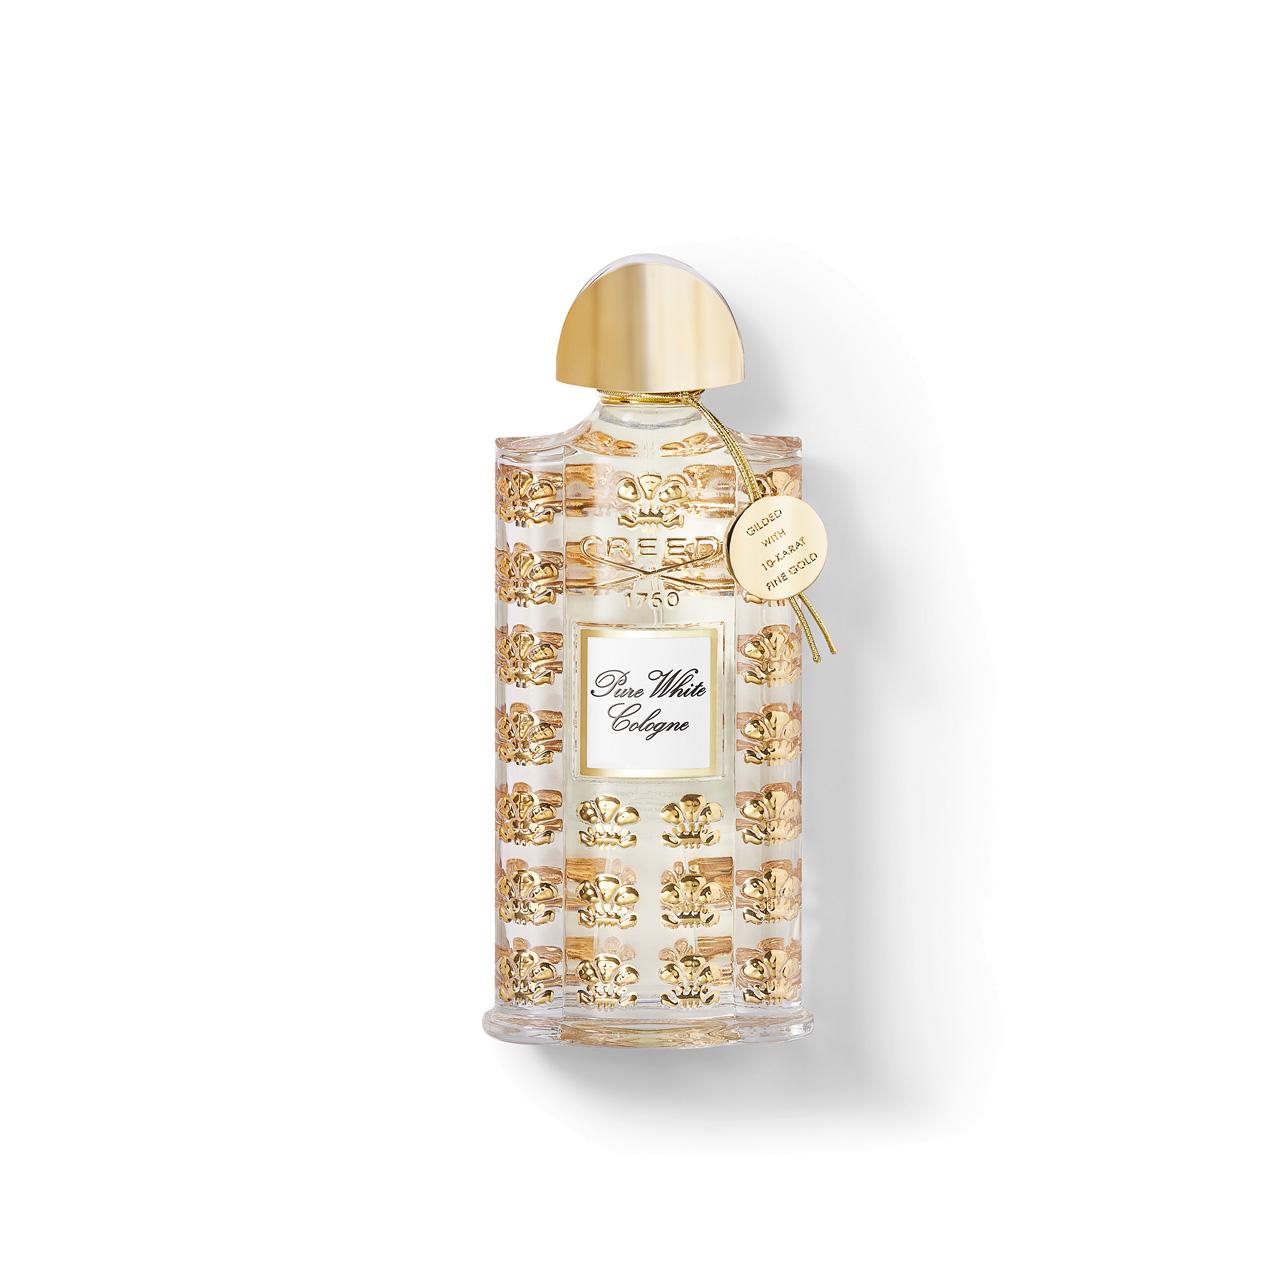 Pure White Cologne - Les Royales Exclusives Millesime